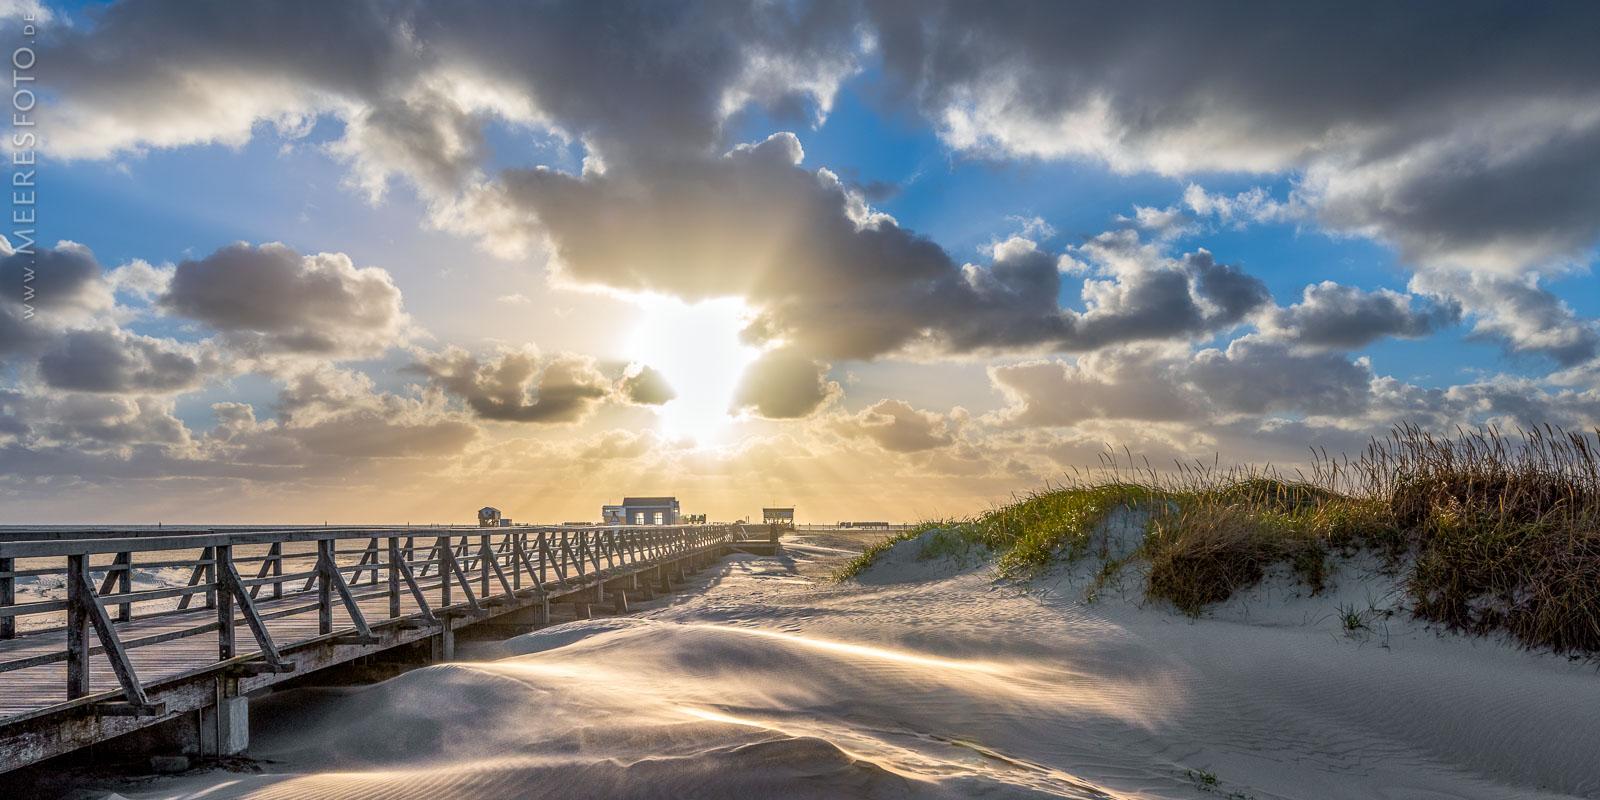 Strandbrücke bei Sturm